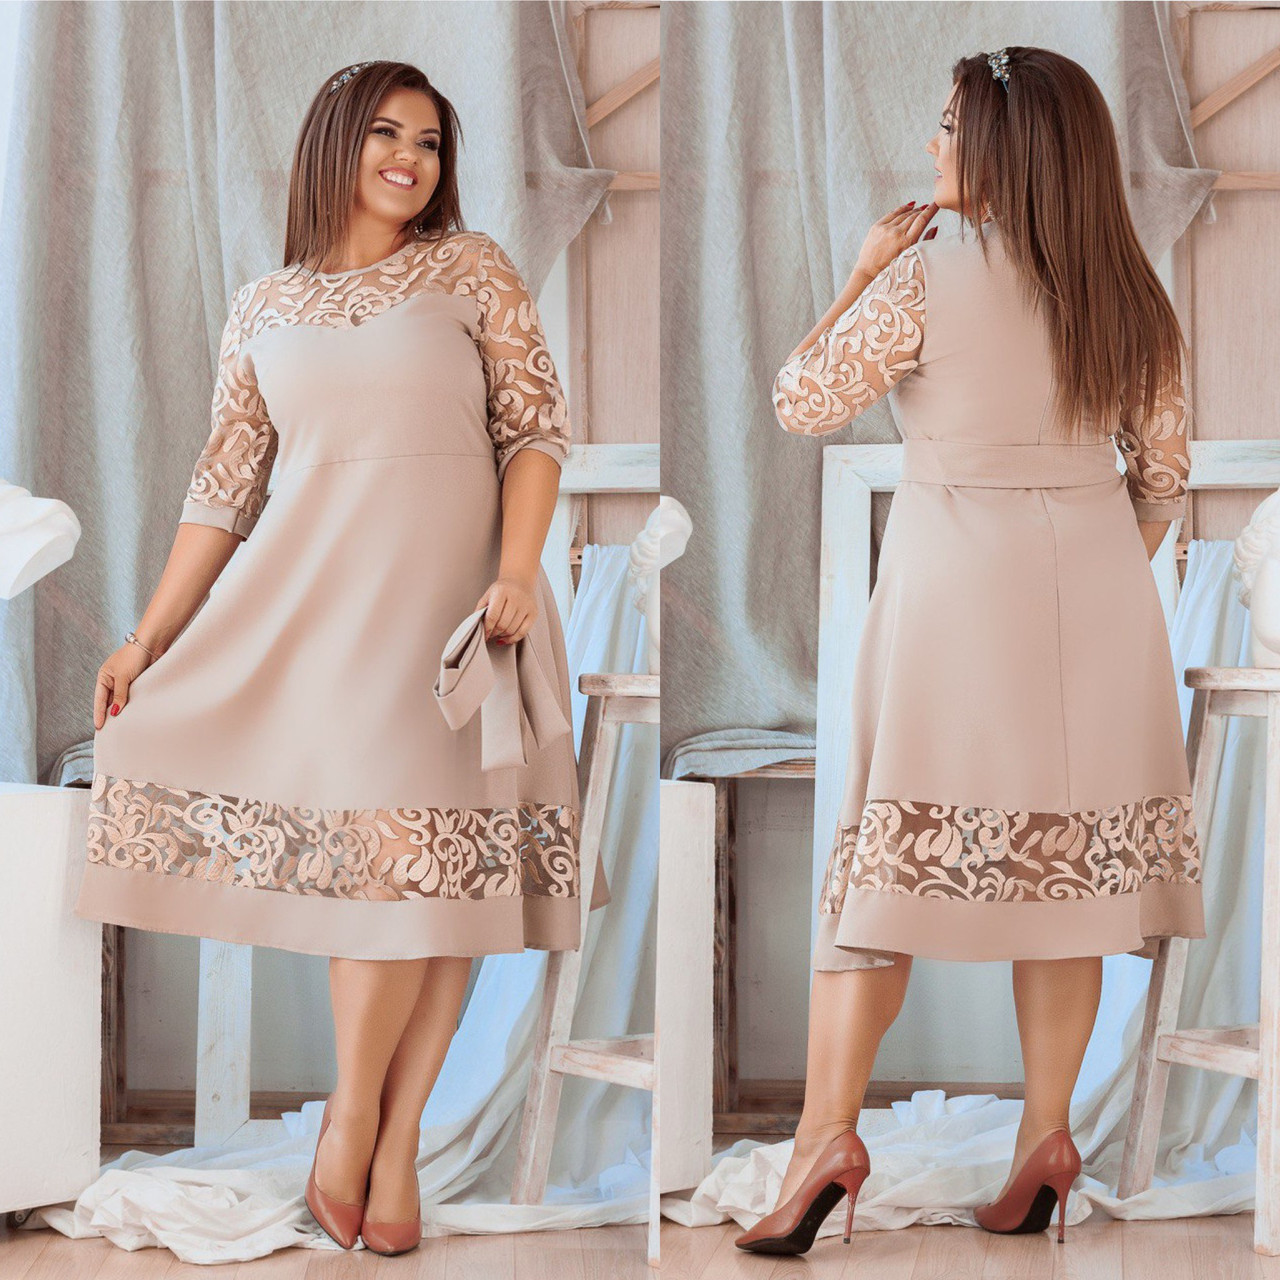 Платье  гипюр вышивка  БАТАЛ в расцветках 712656